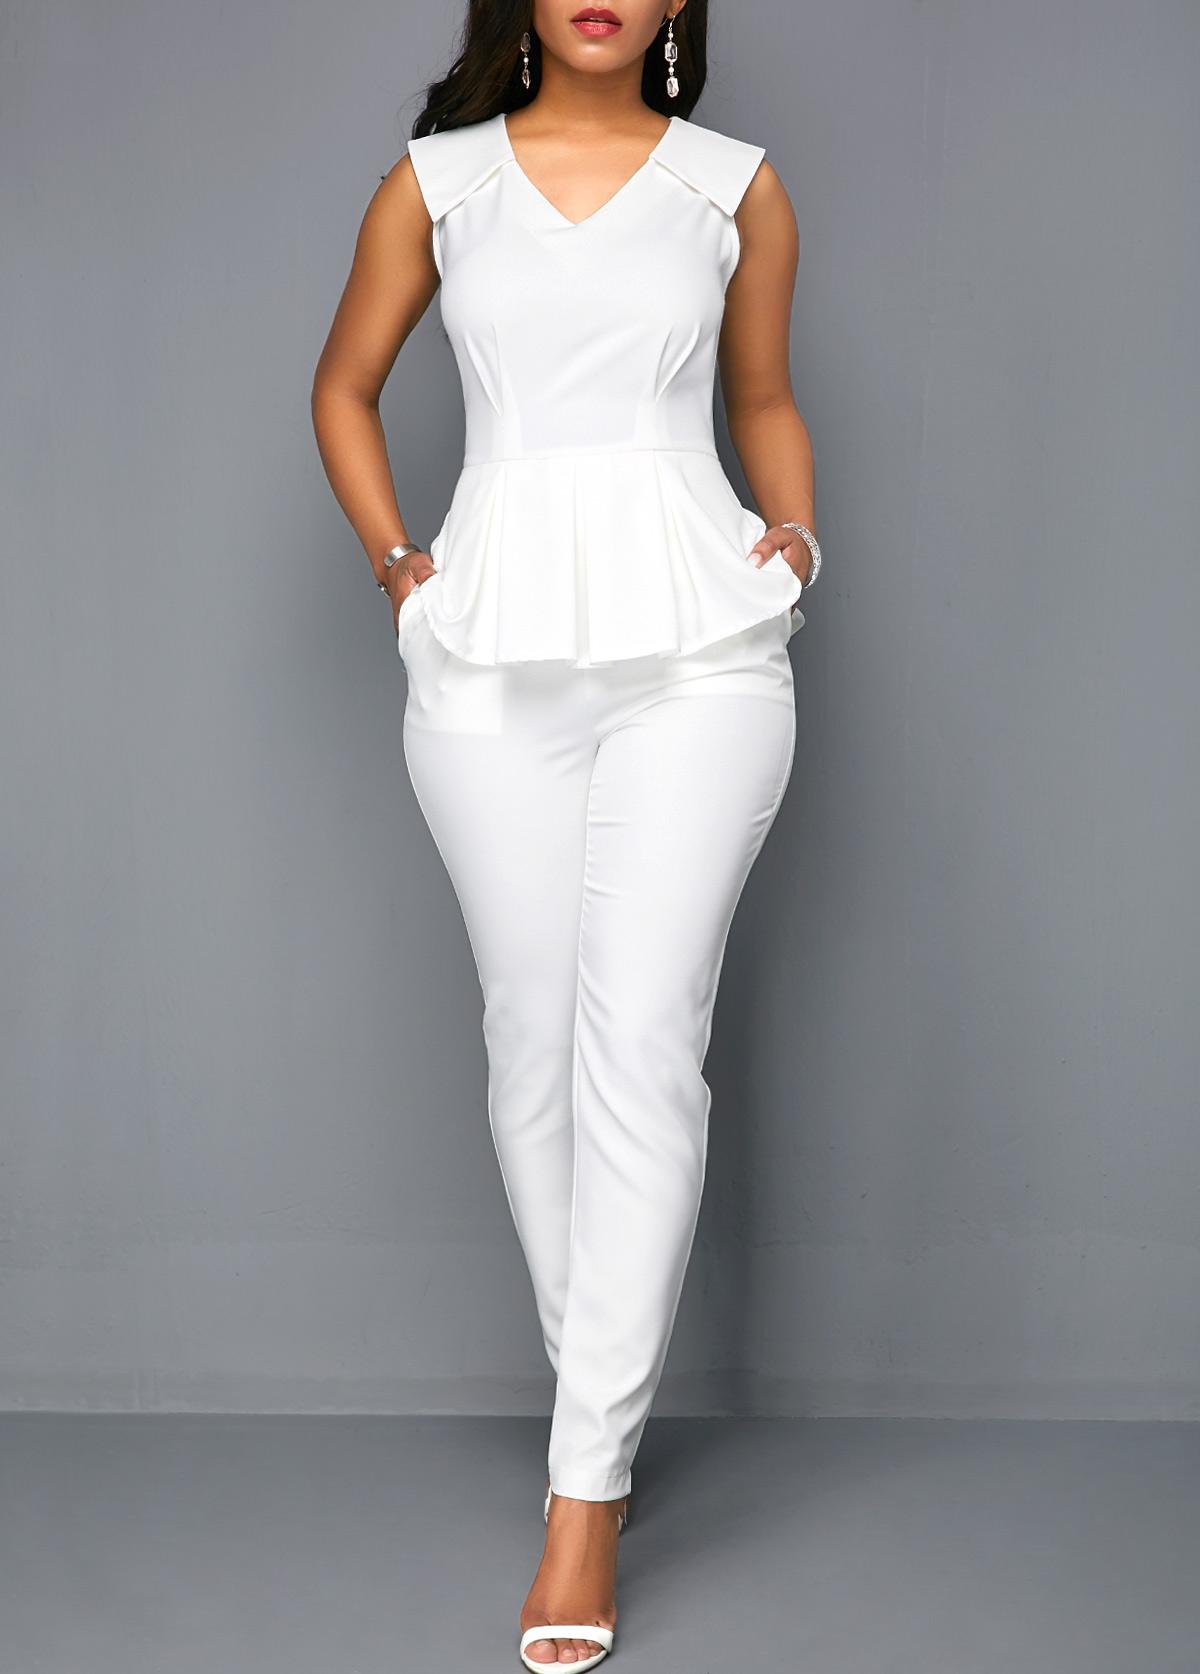 White V Neck Sleeveless Peplum Jumpsuit